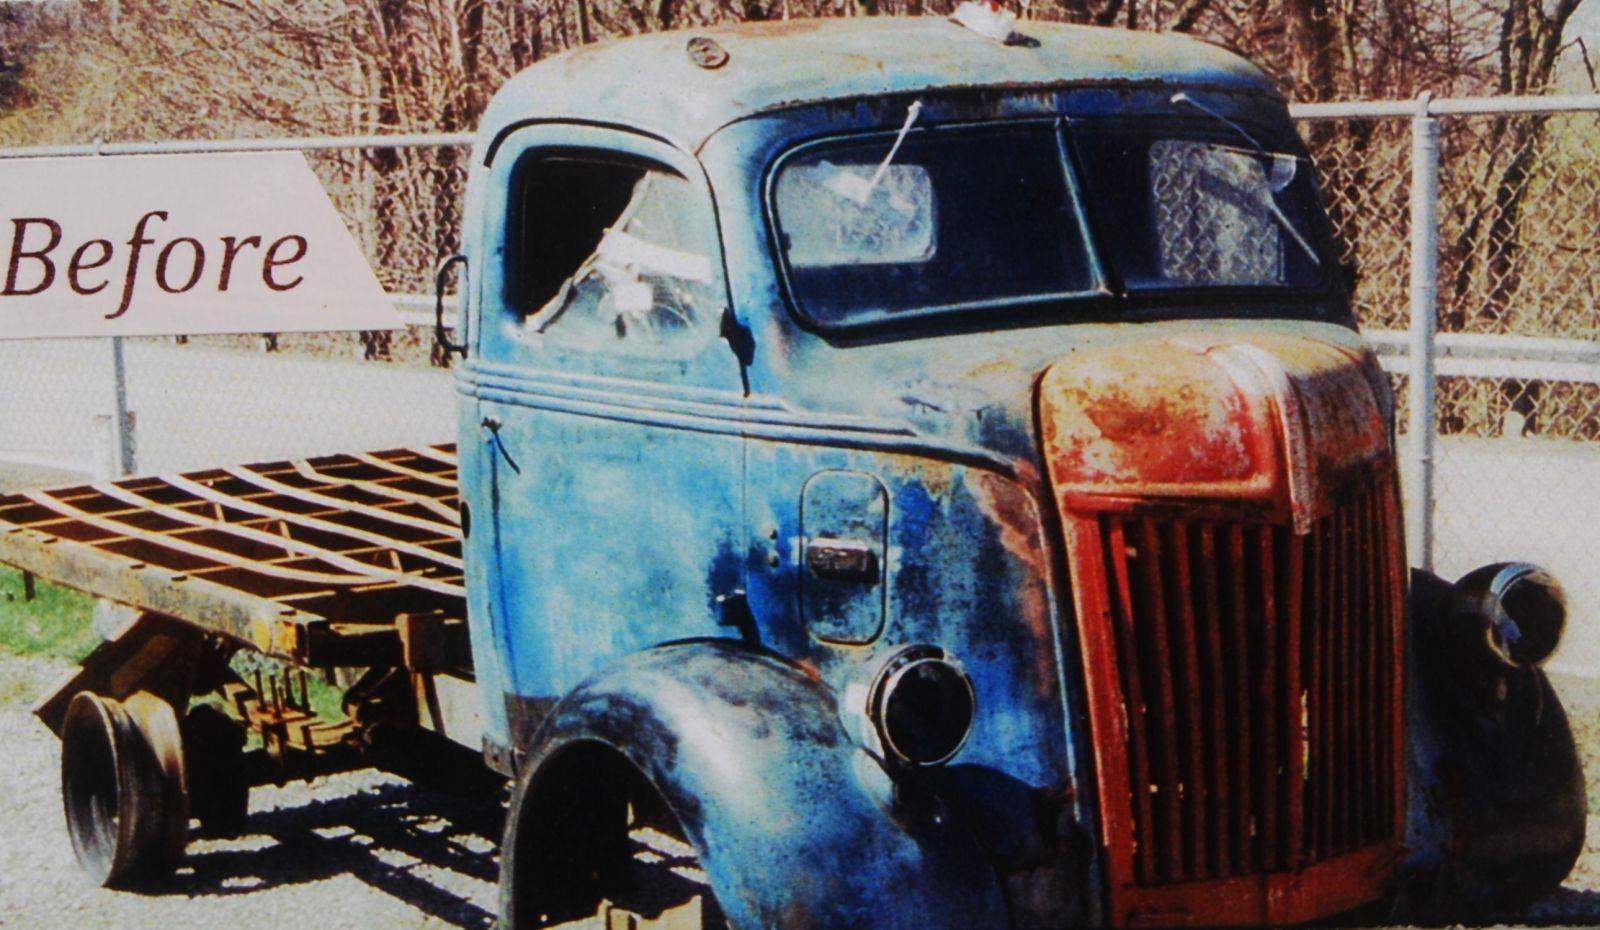 Keystone Cabover Comes Back Home Hotrod Hotline - Ramp ford car show